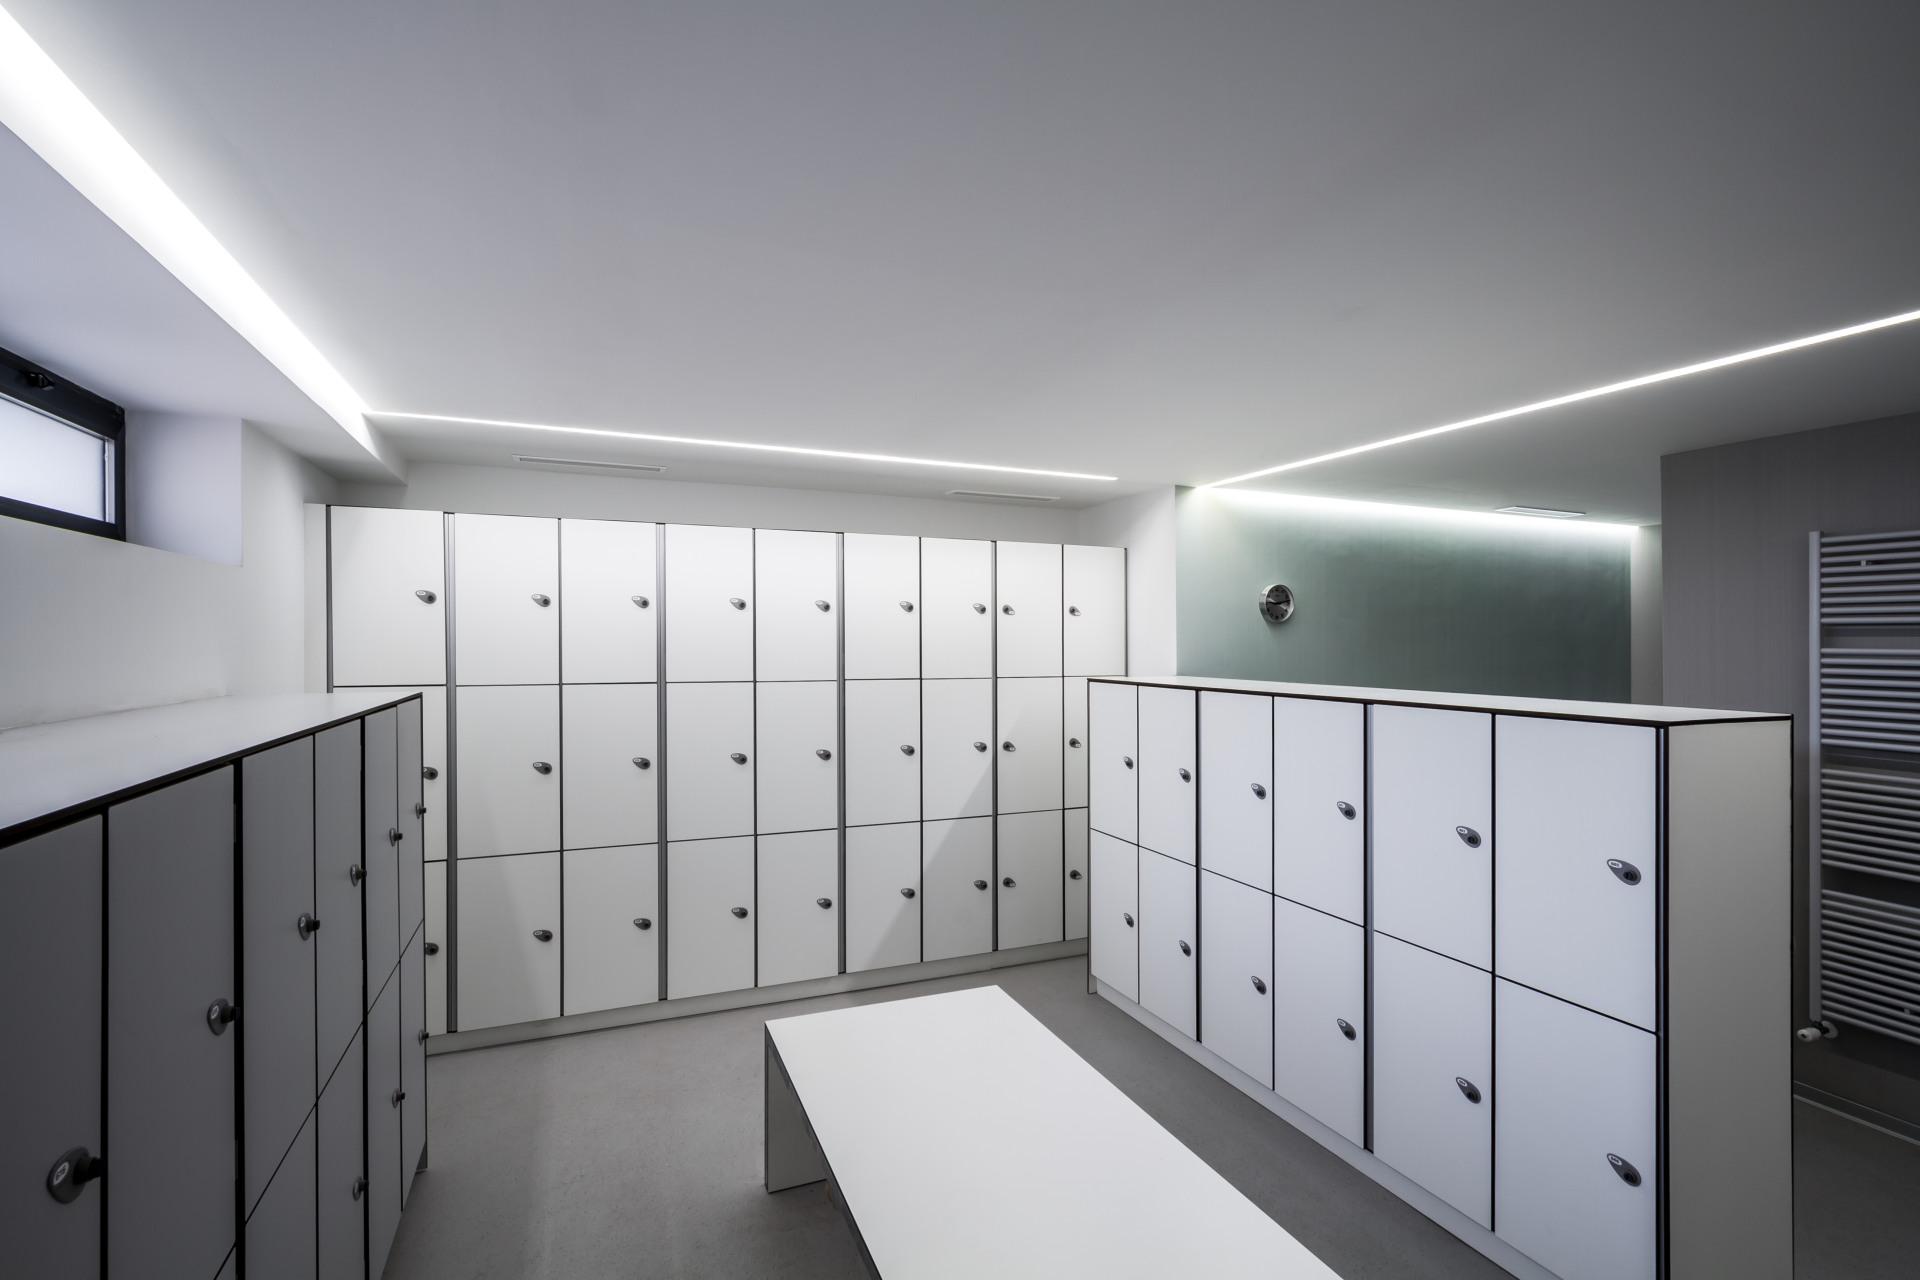 fotografia-arquitectura-valencia-german-cabo-bfm-edificatoria-club-tenis (12)